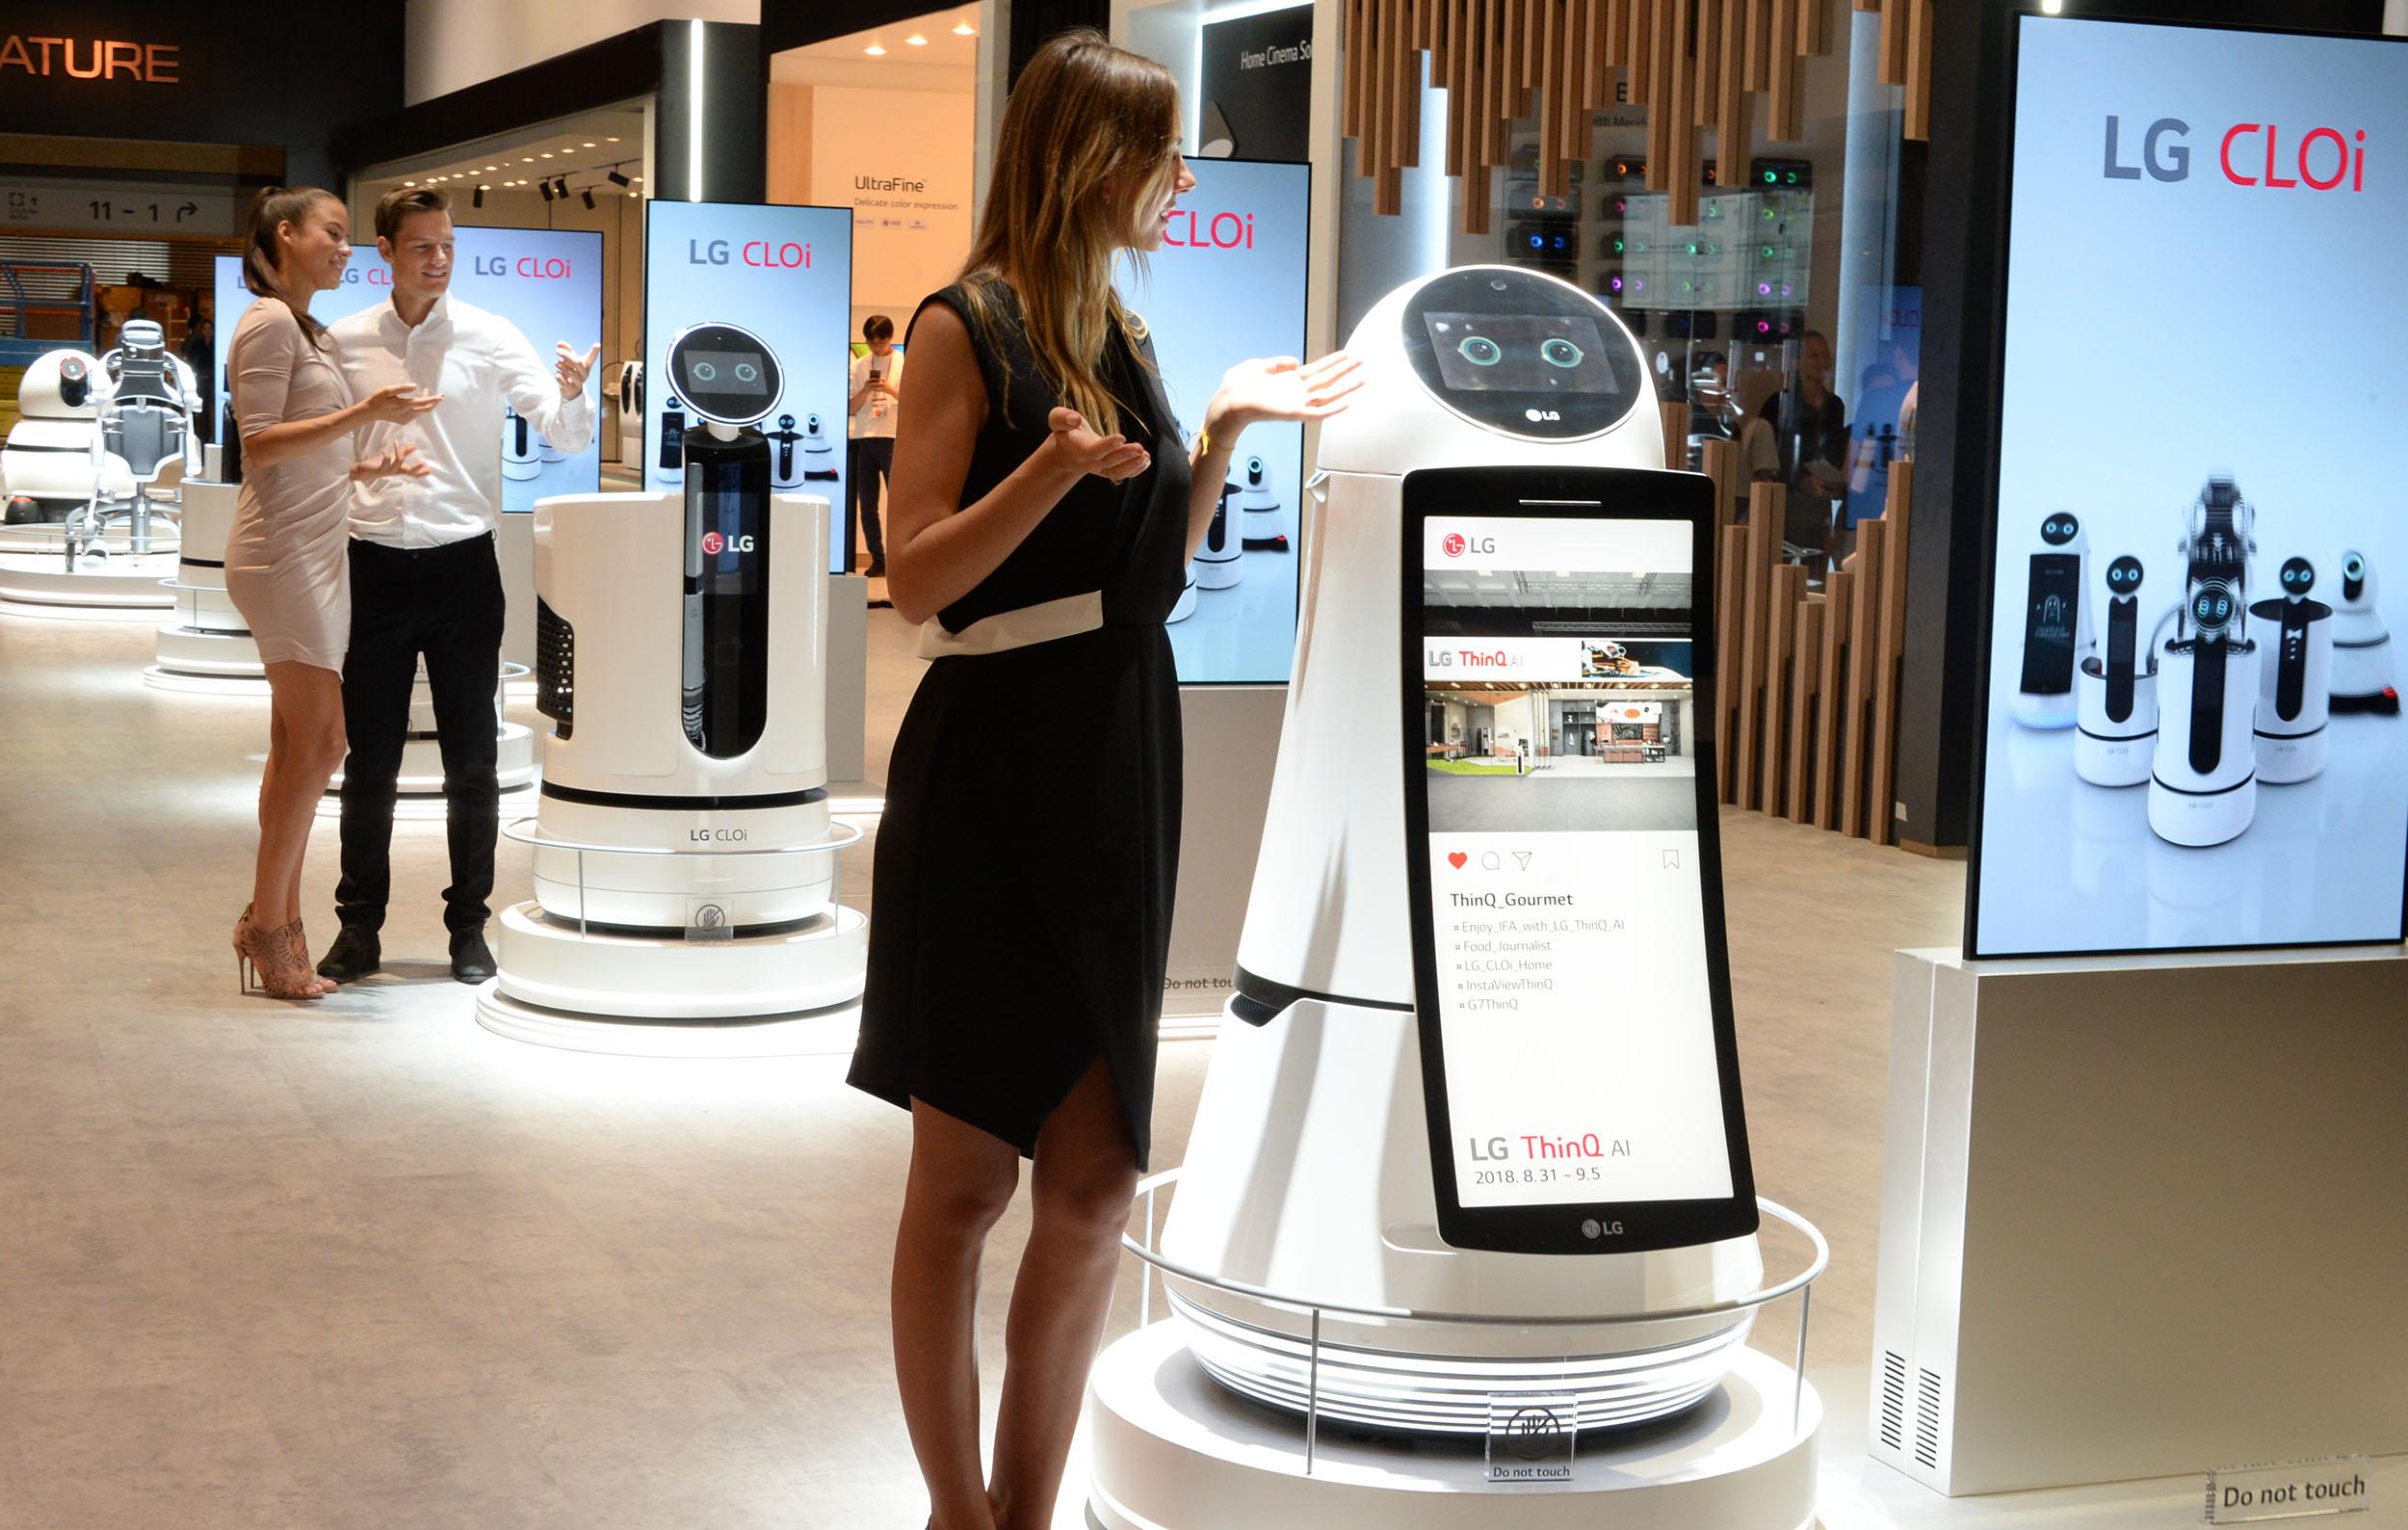 LG전자가 IFA 2018에서 다양한 LG 클로이 로봇을 선보였다.